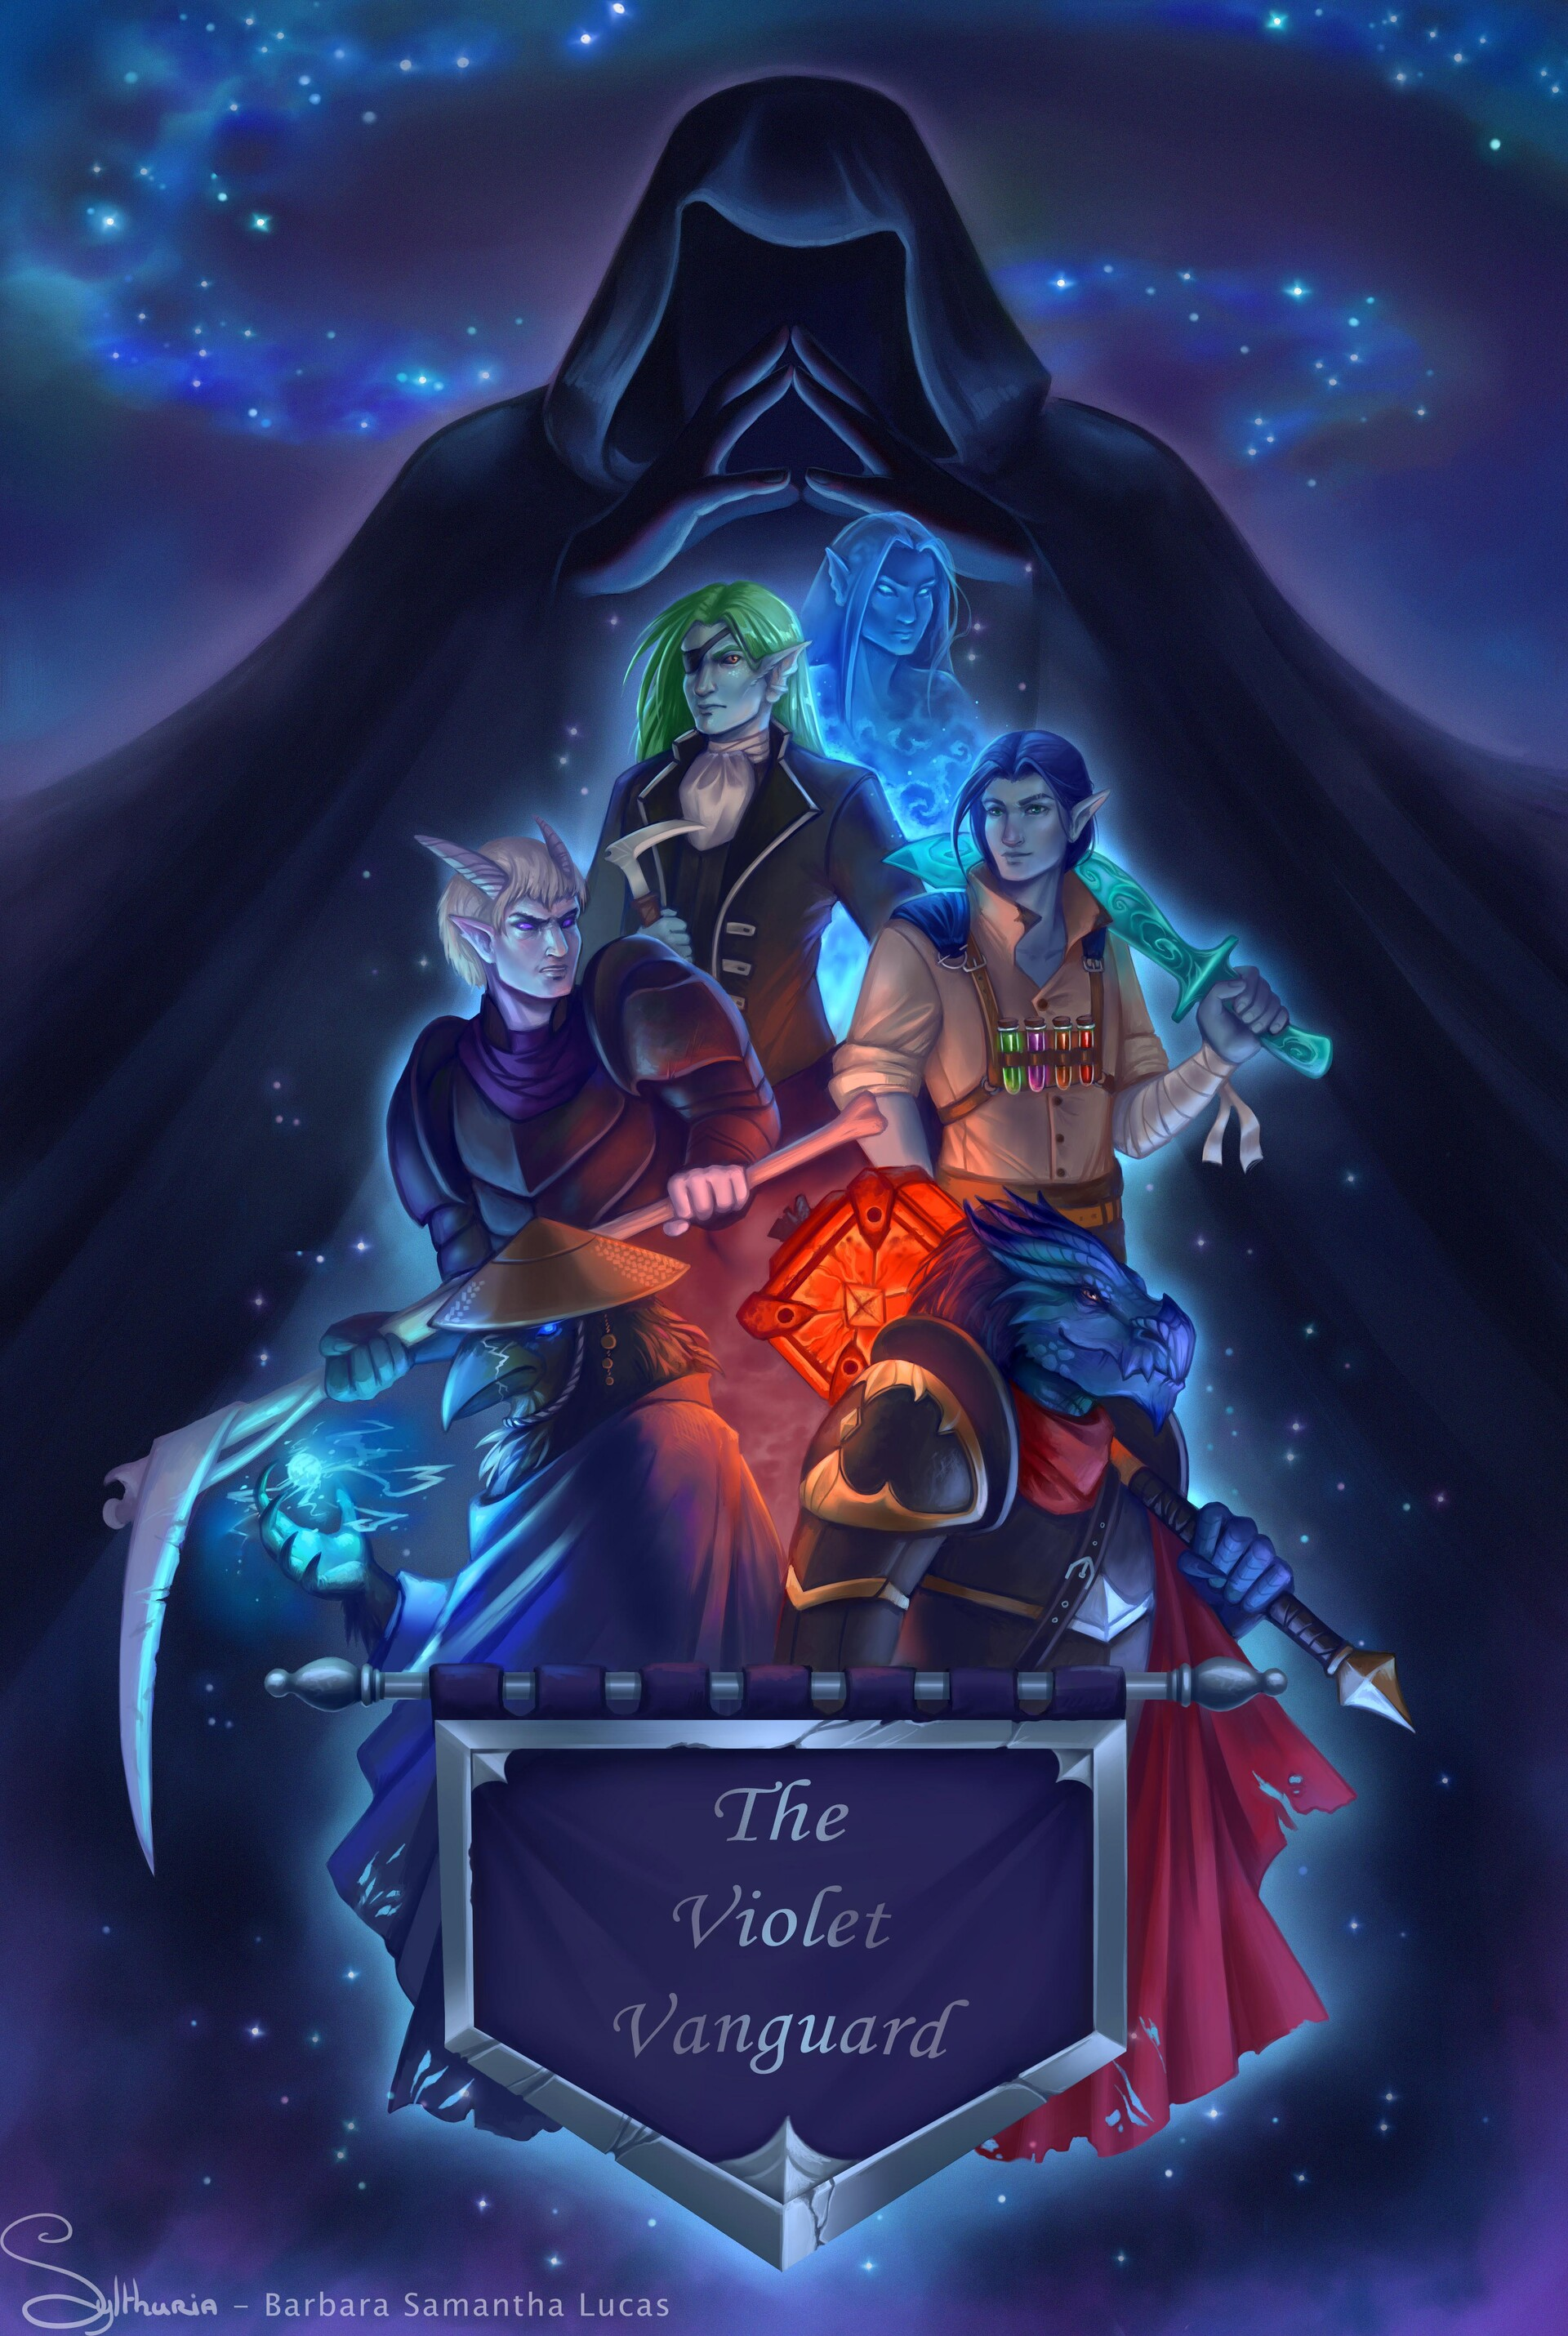 D&D group - Poster